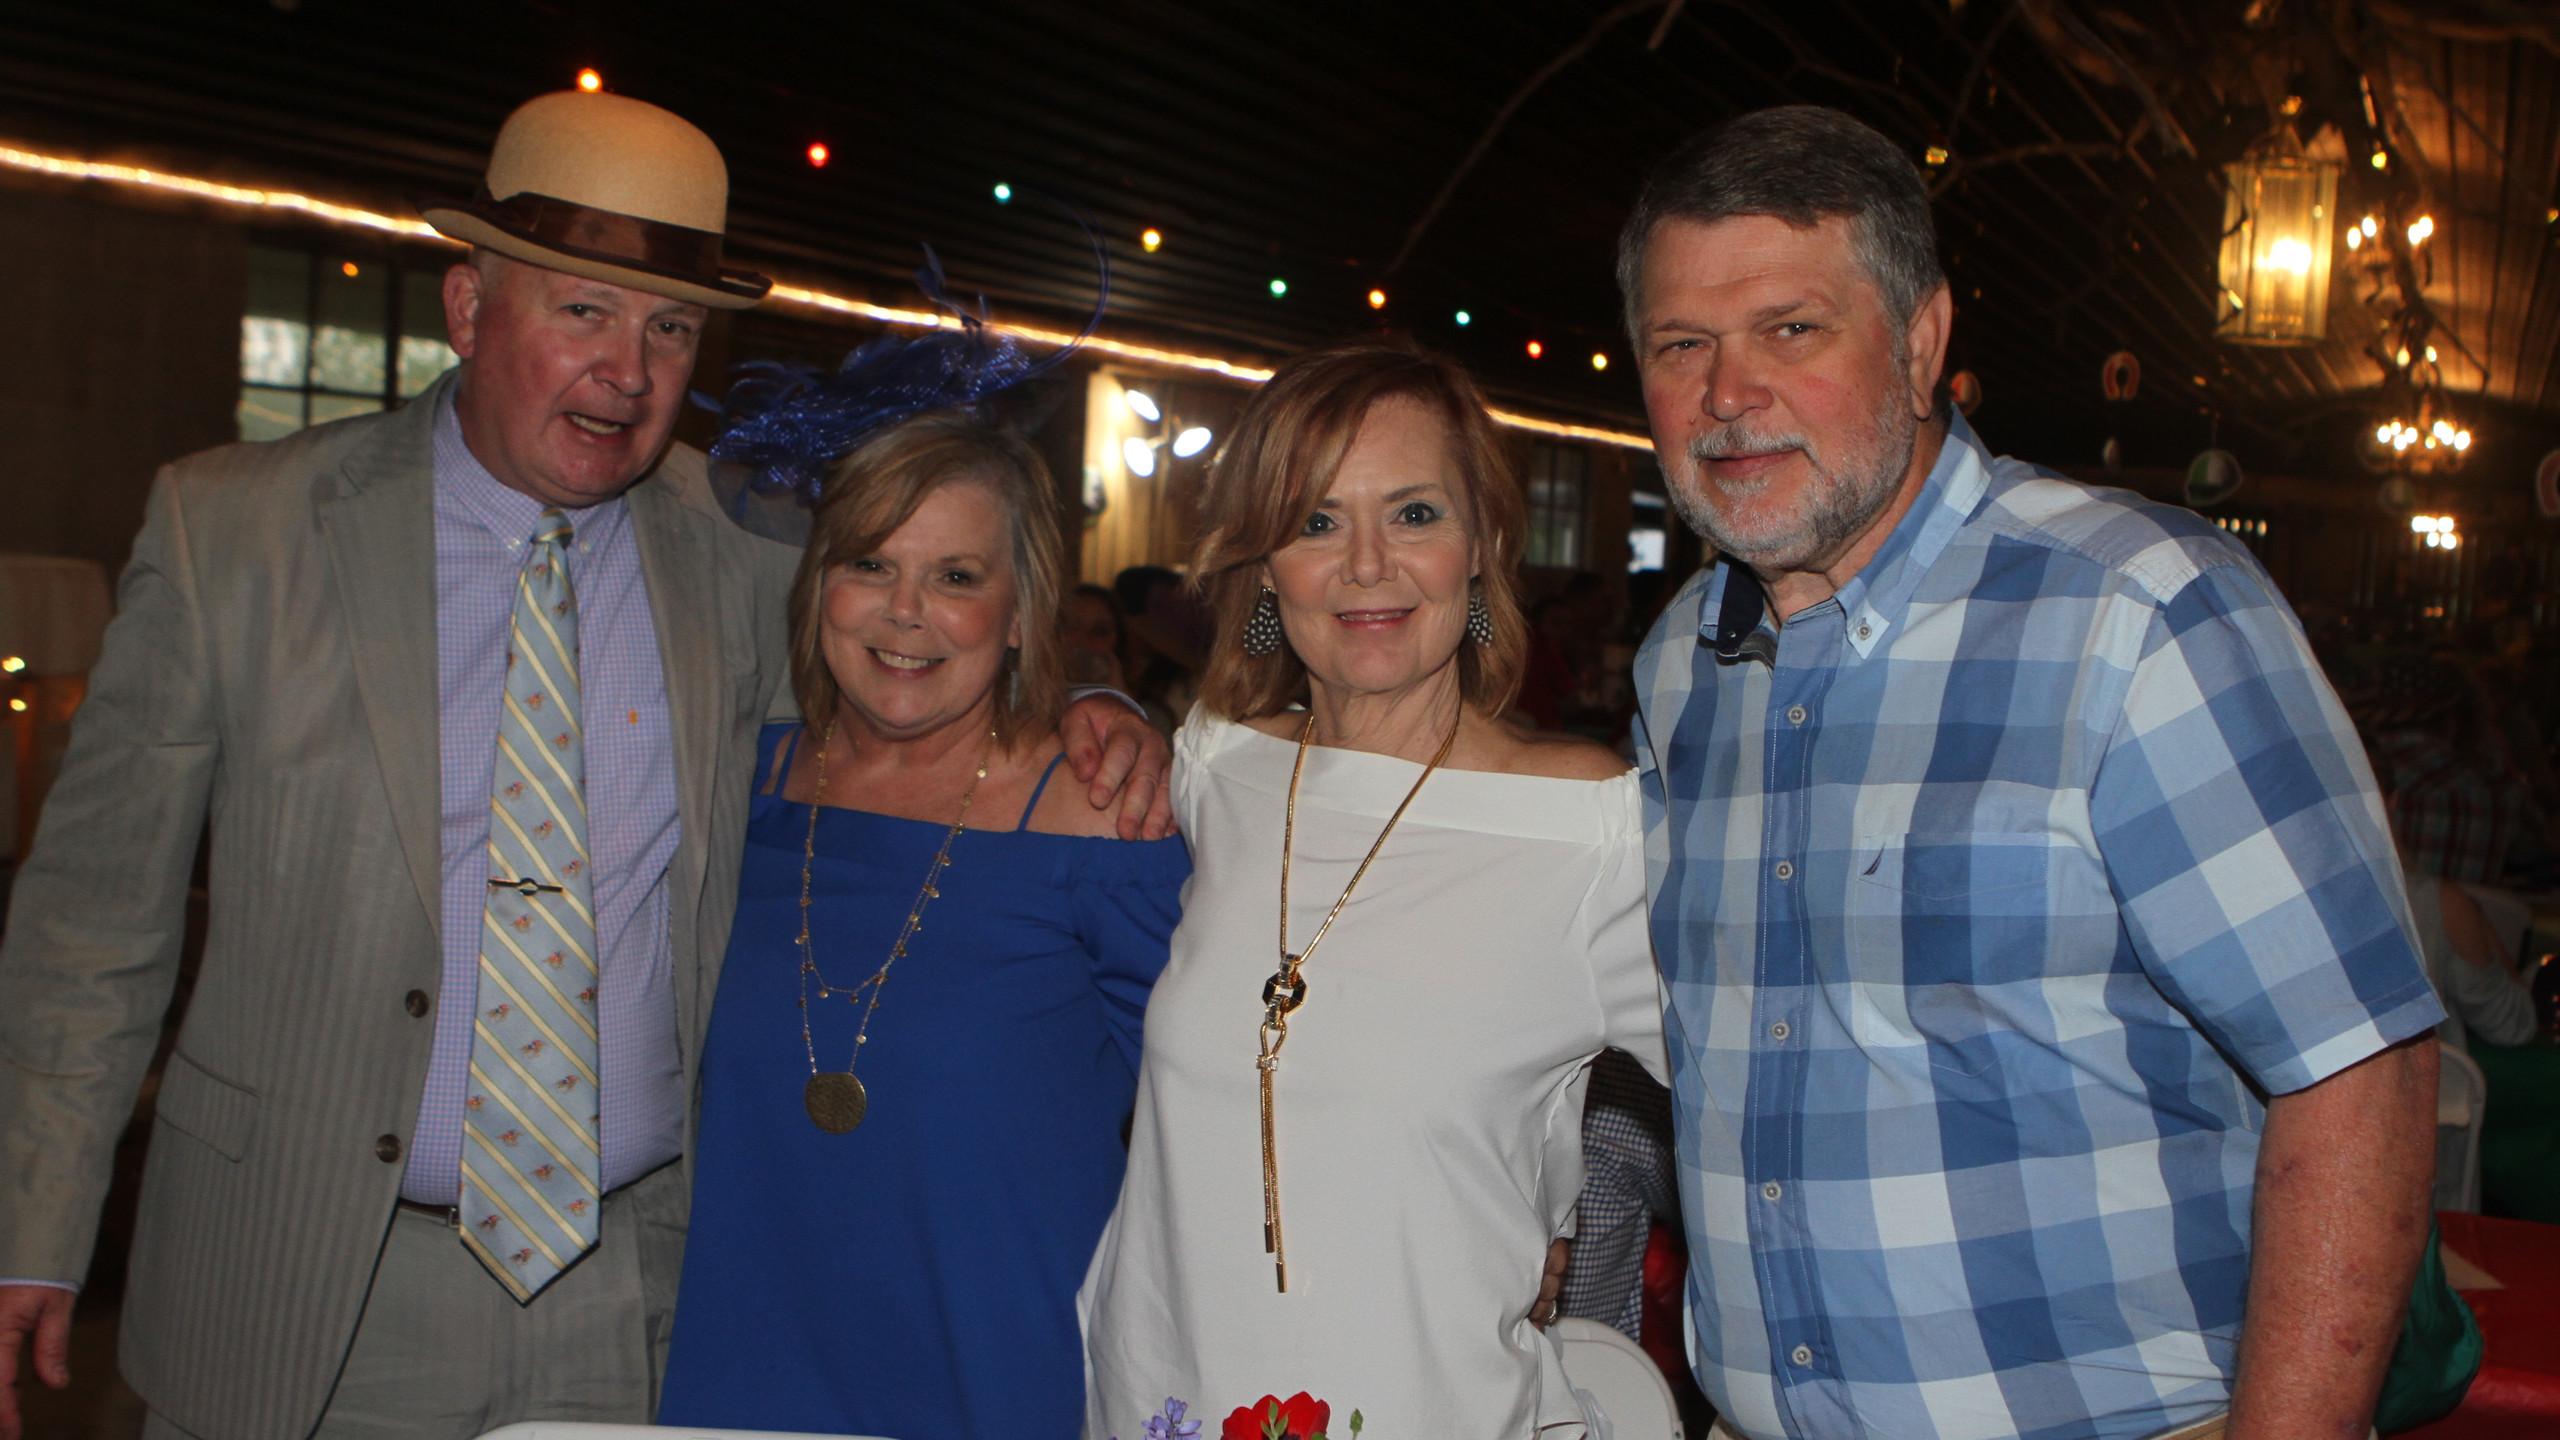 Mark & Jan Mayes, Brenda & Mike Ousley